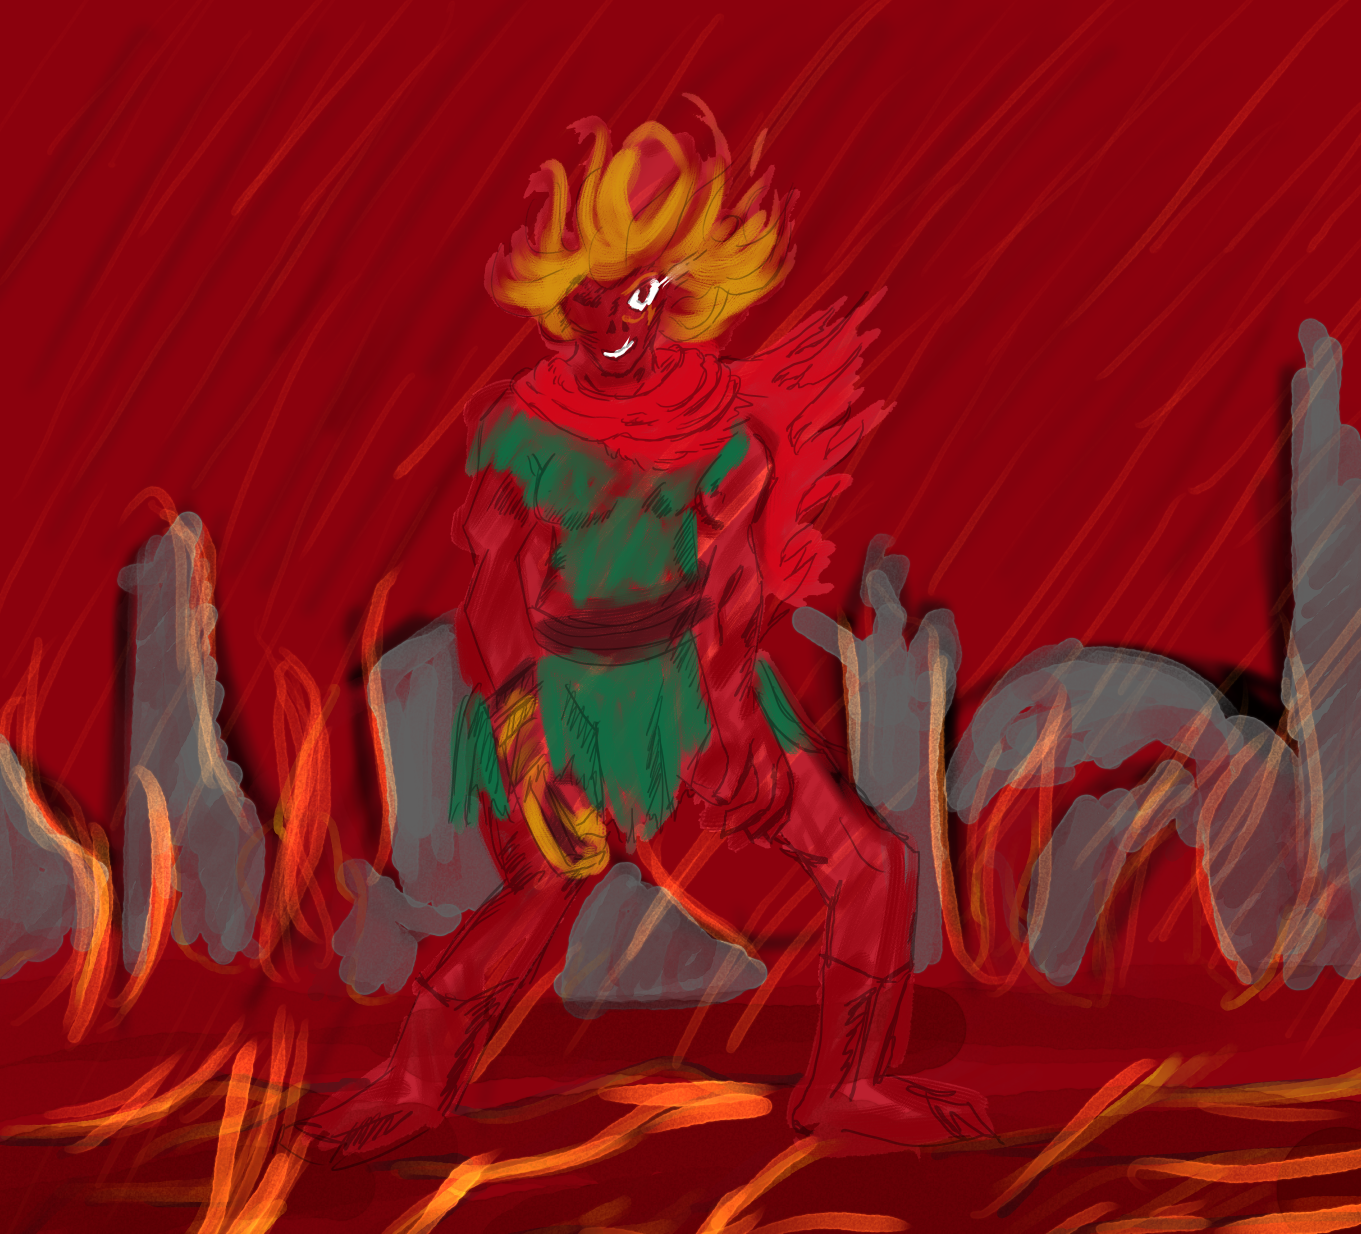 tyrant fall 3c.png